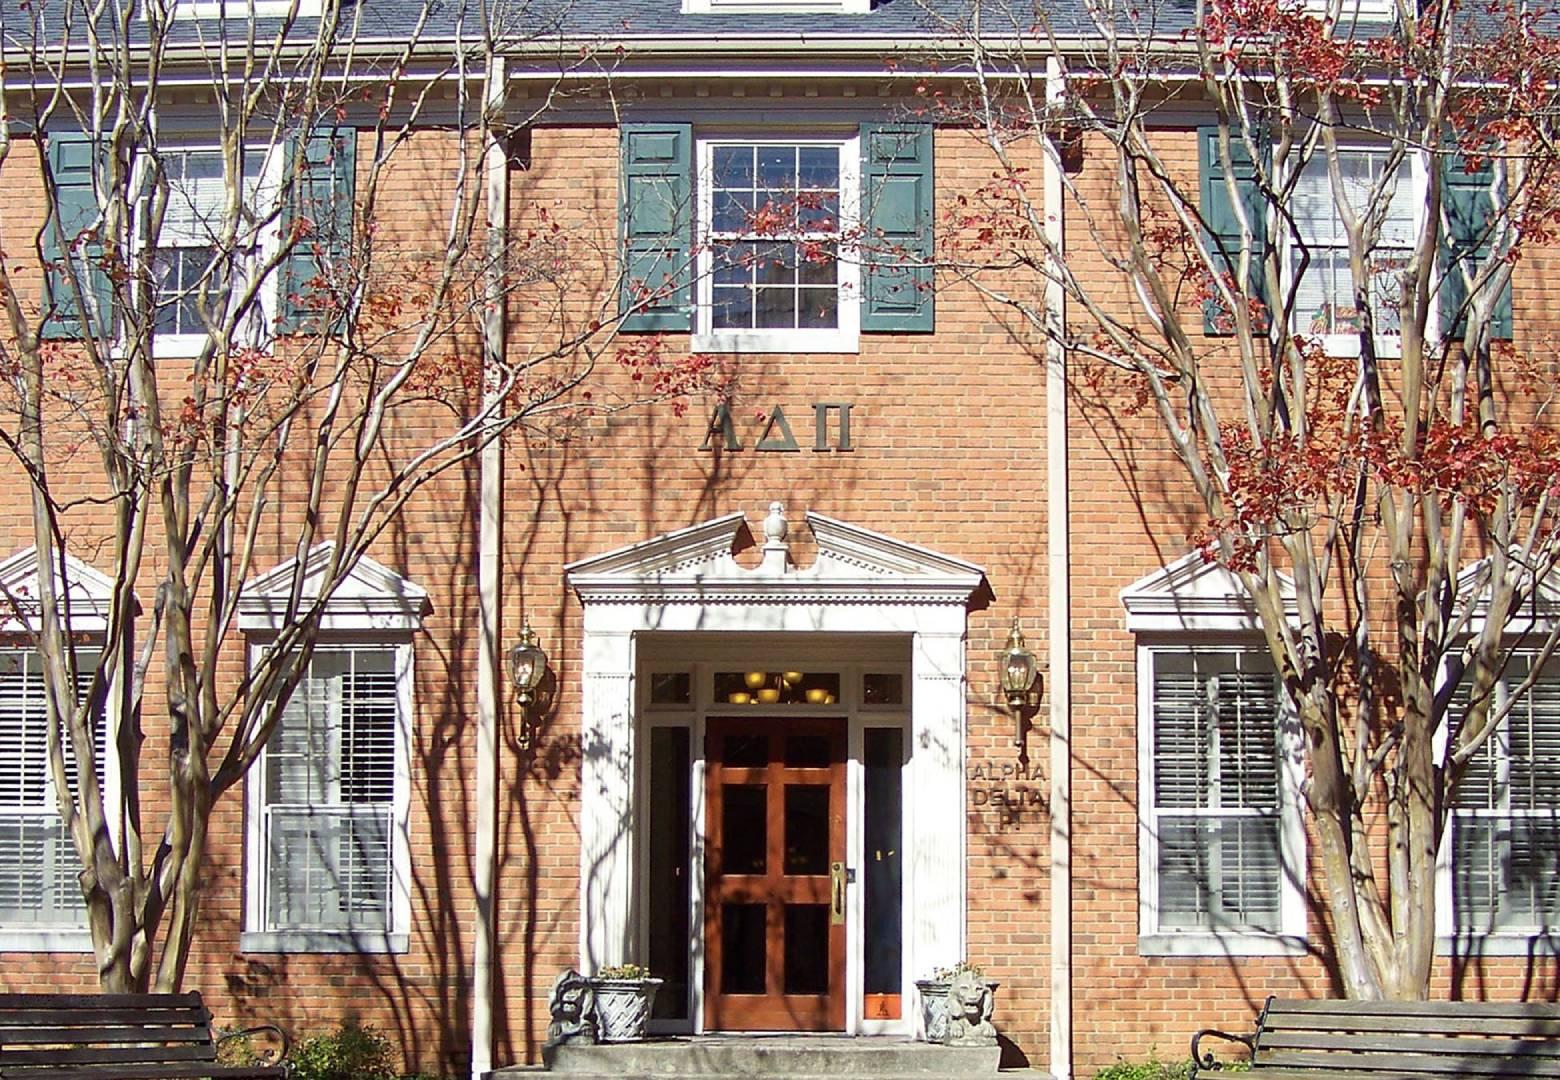 Samford University Student Housing, Homewood, AL